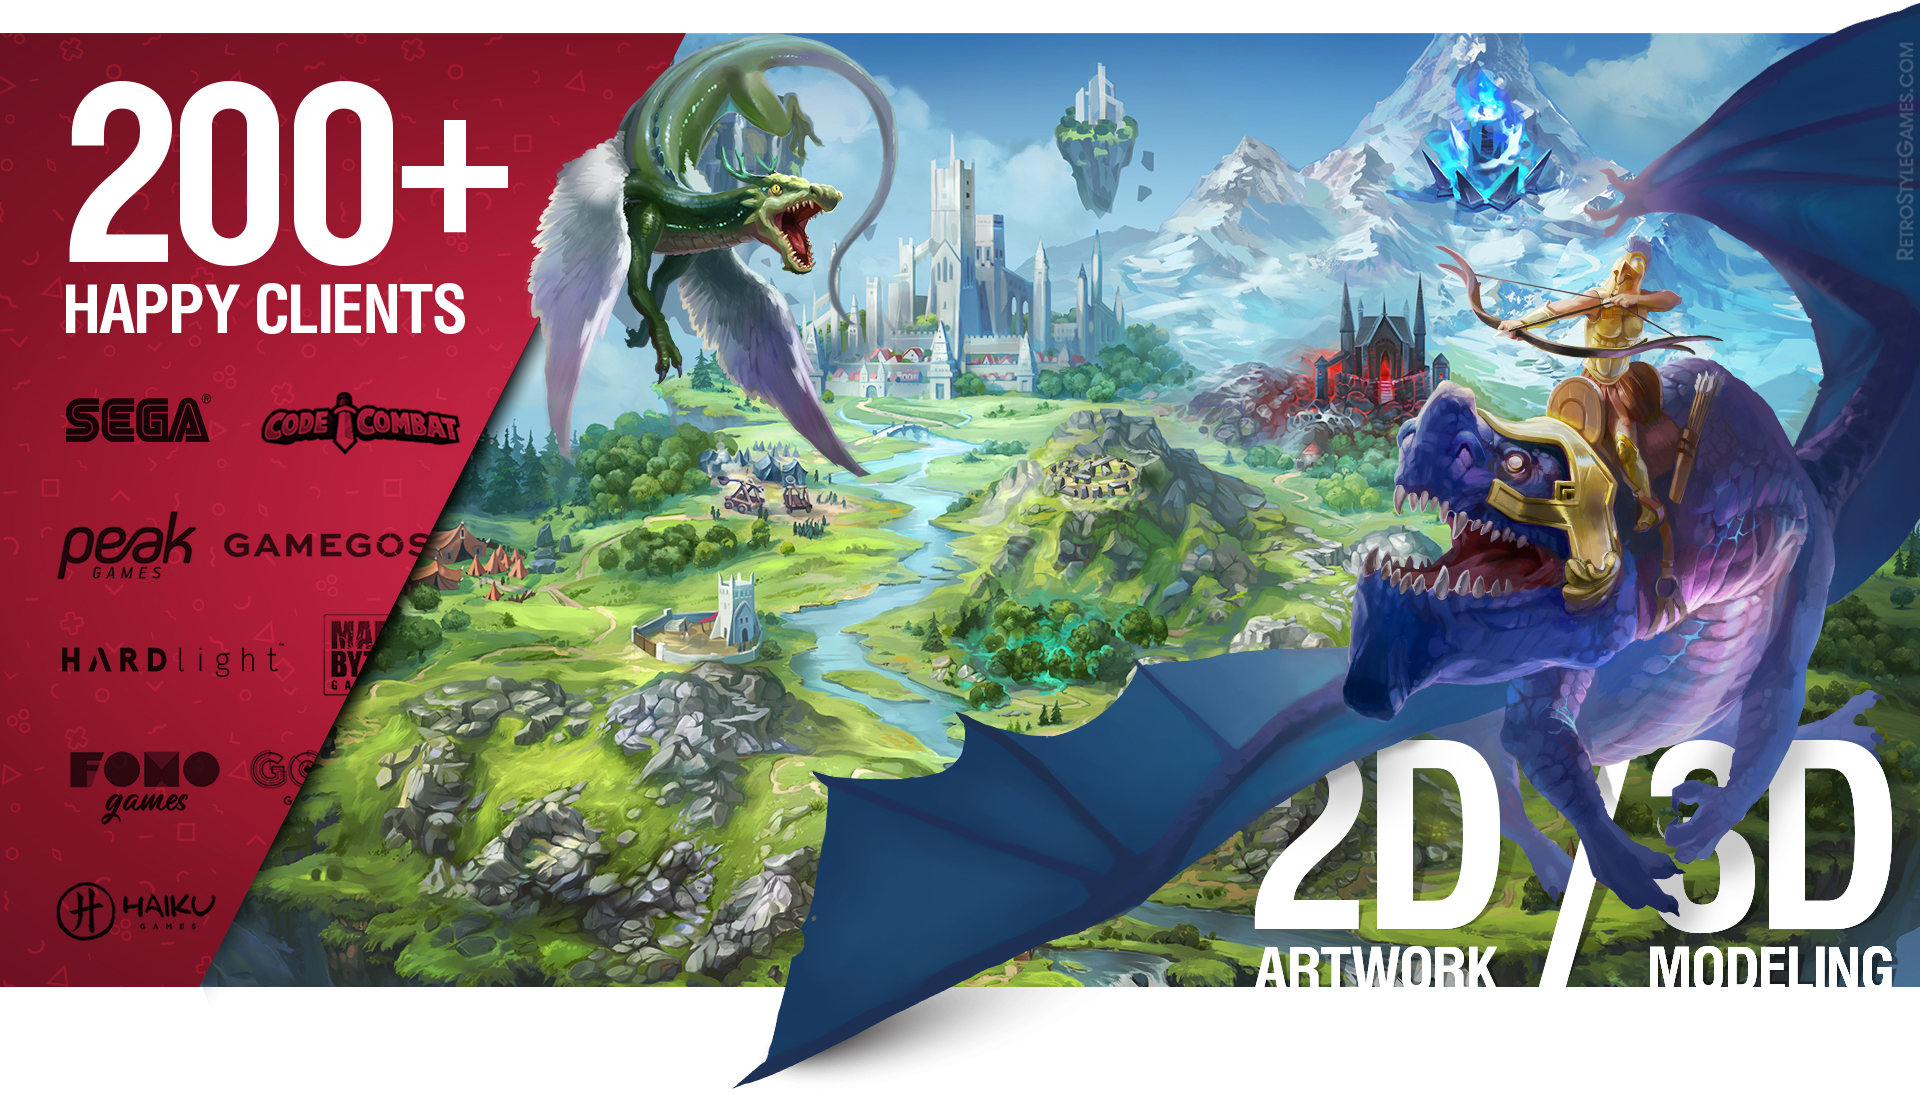 Game Art Outsourcing Services 2D Artwork 3D Modeling